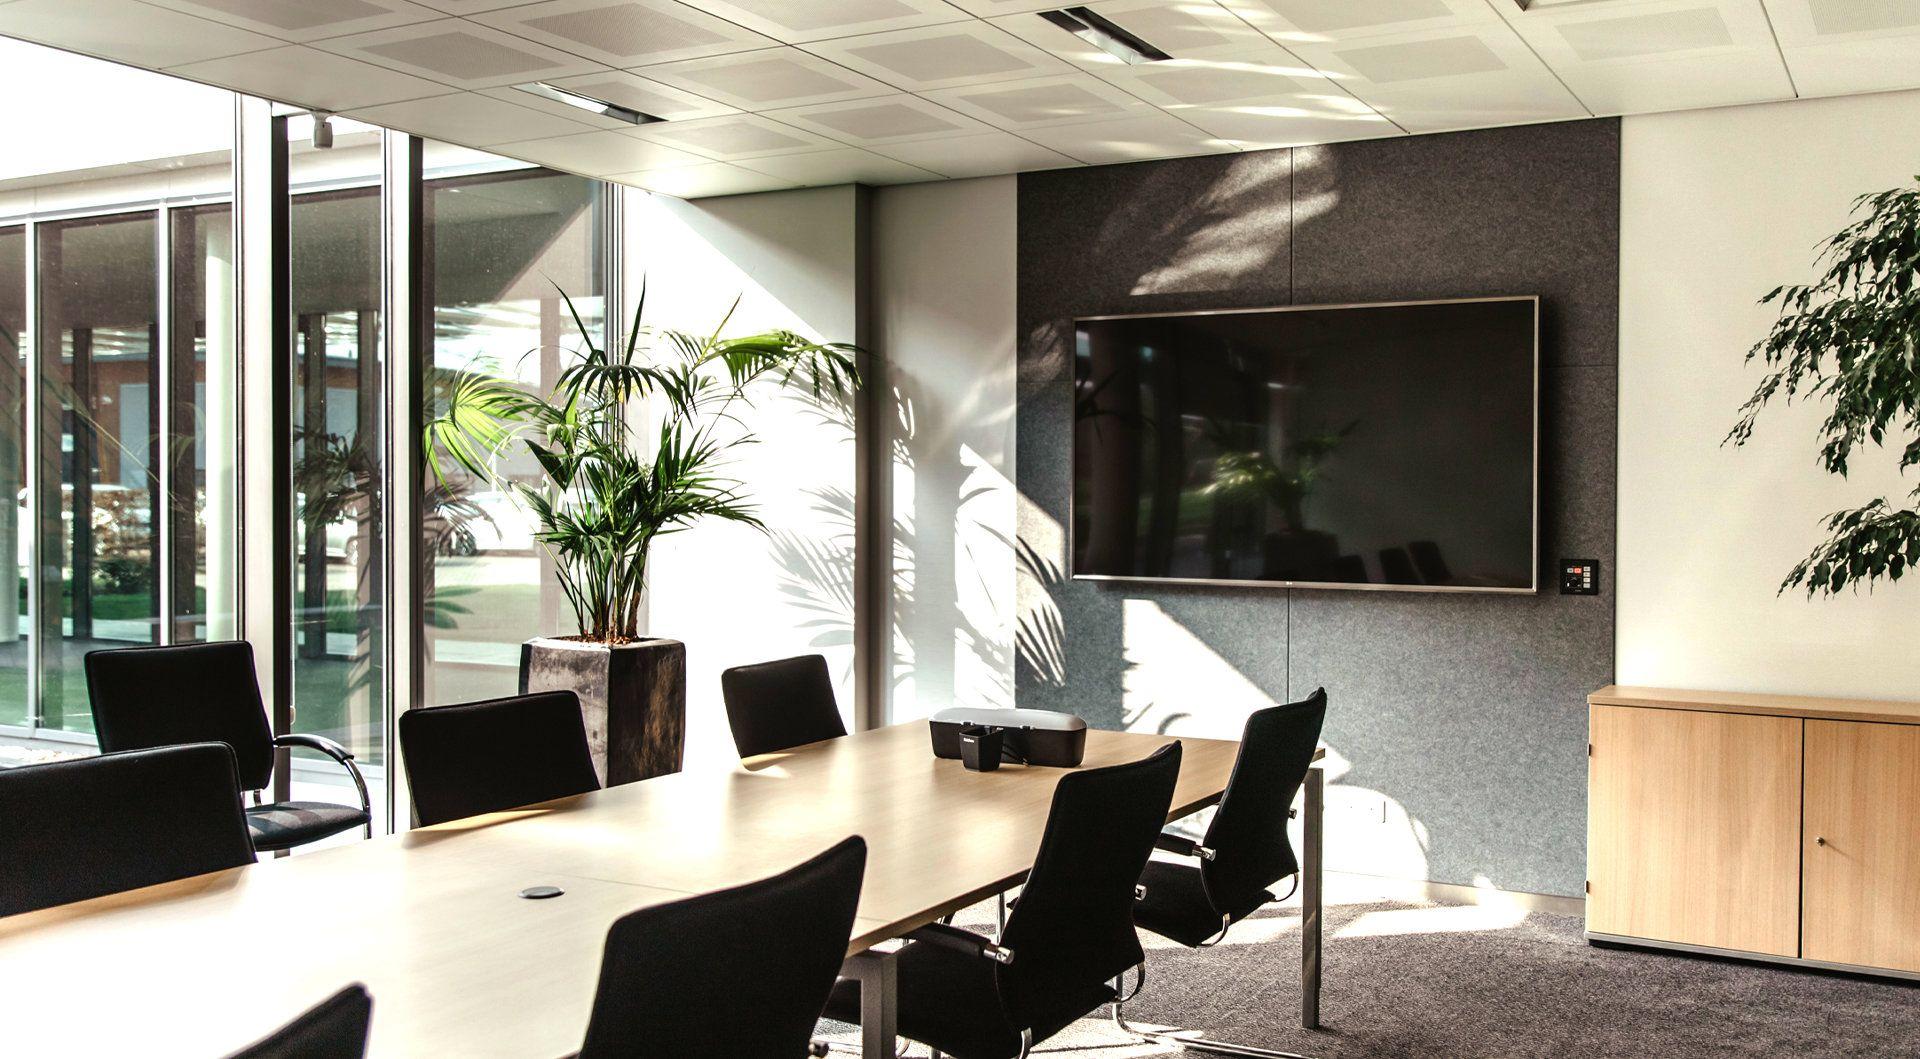 "Projecta Tensioned Elpro Concept HD projectiescherm 3,89 m (153"") 16:10 - Case studie de vries"